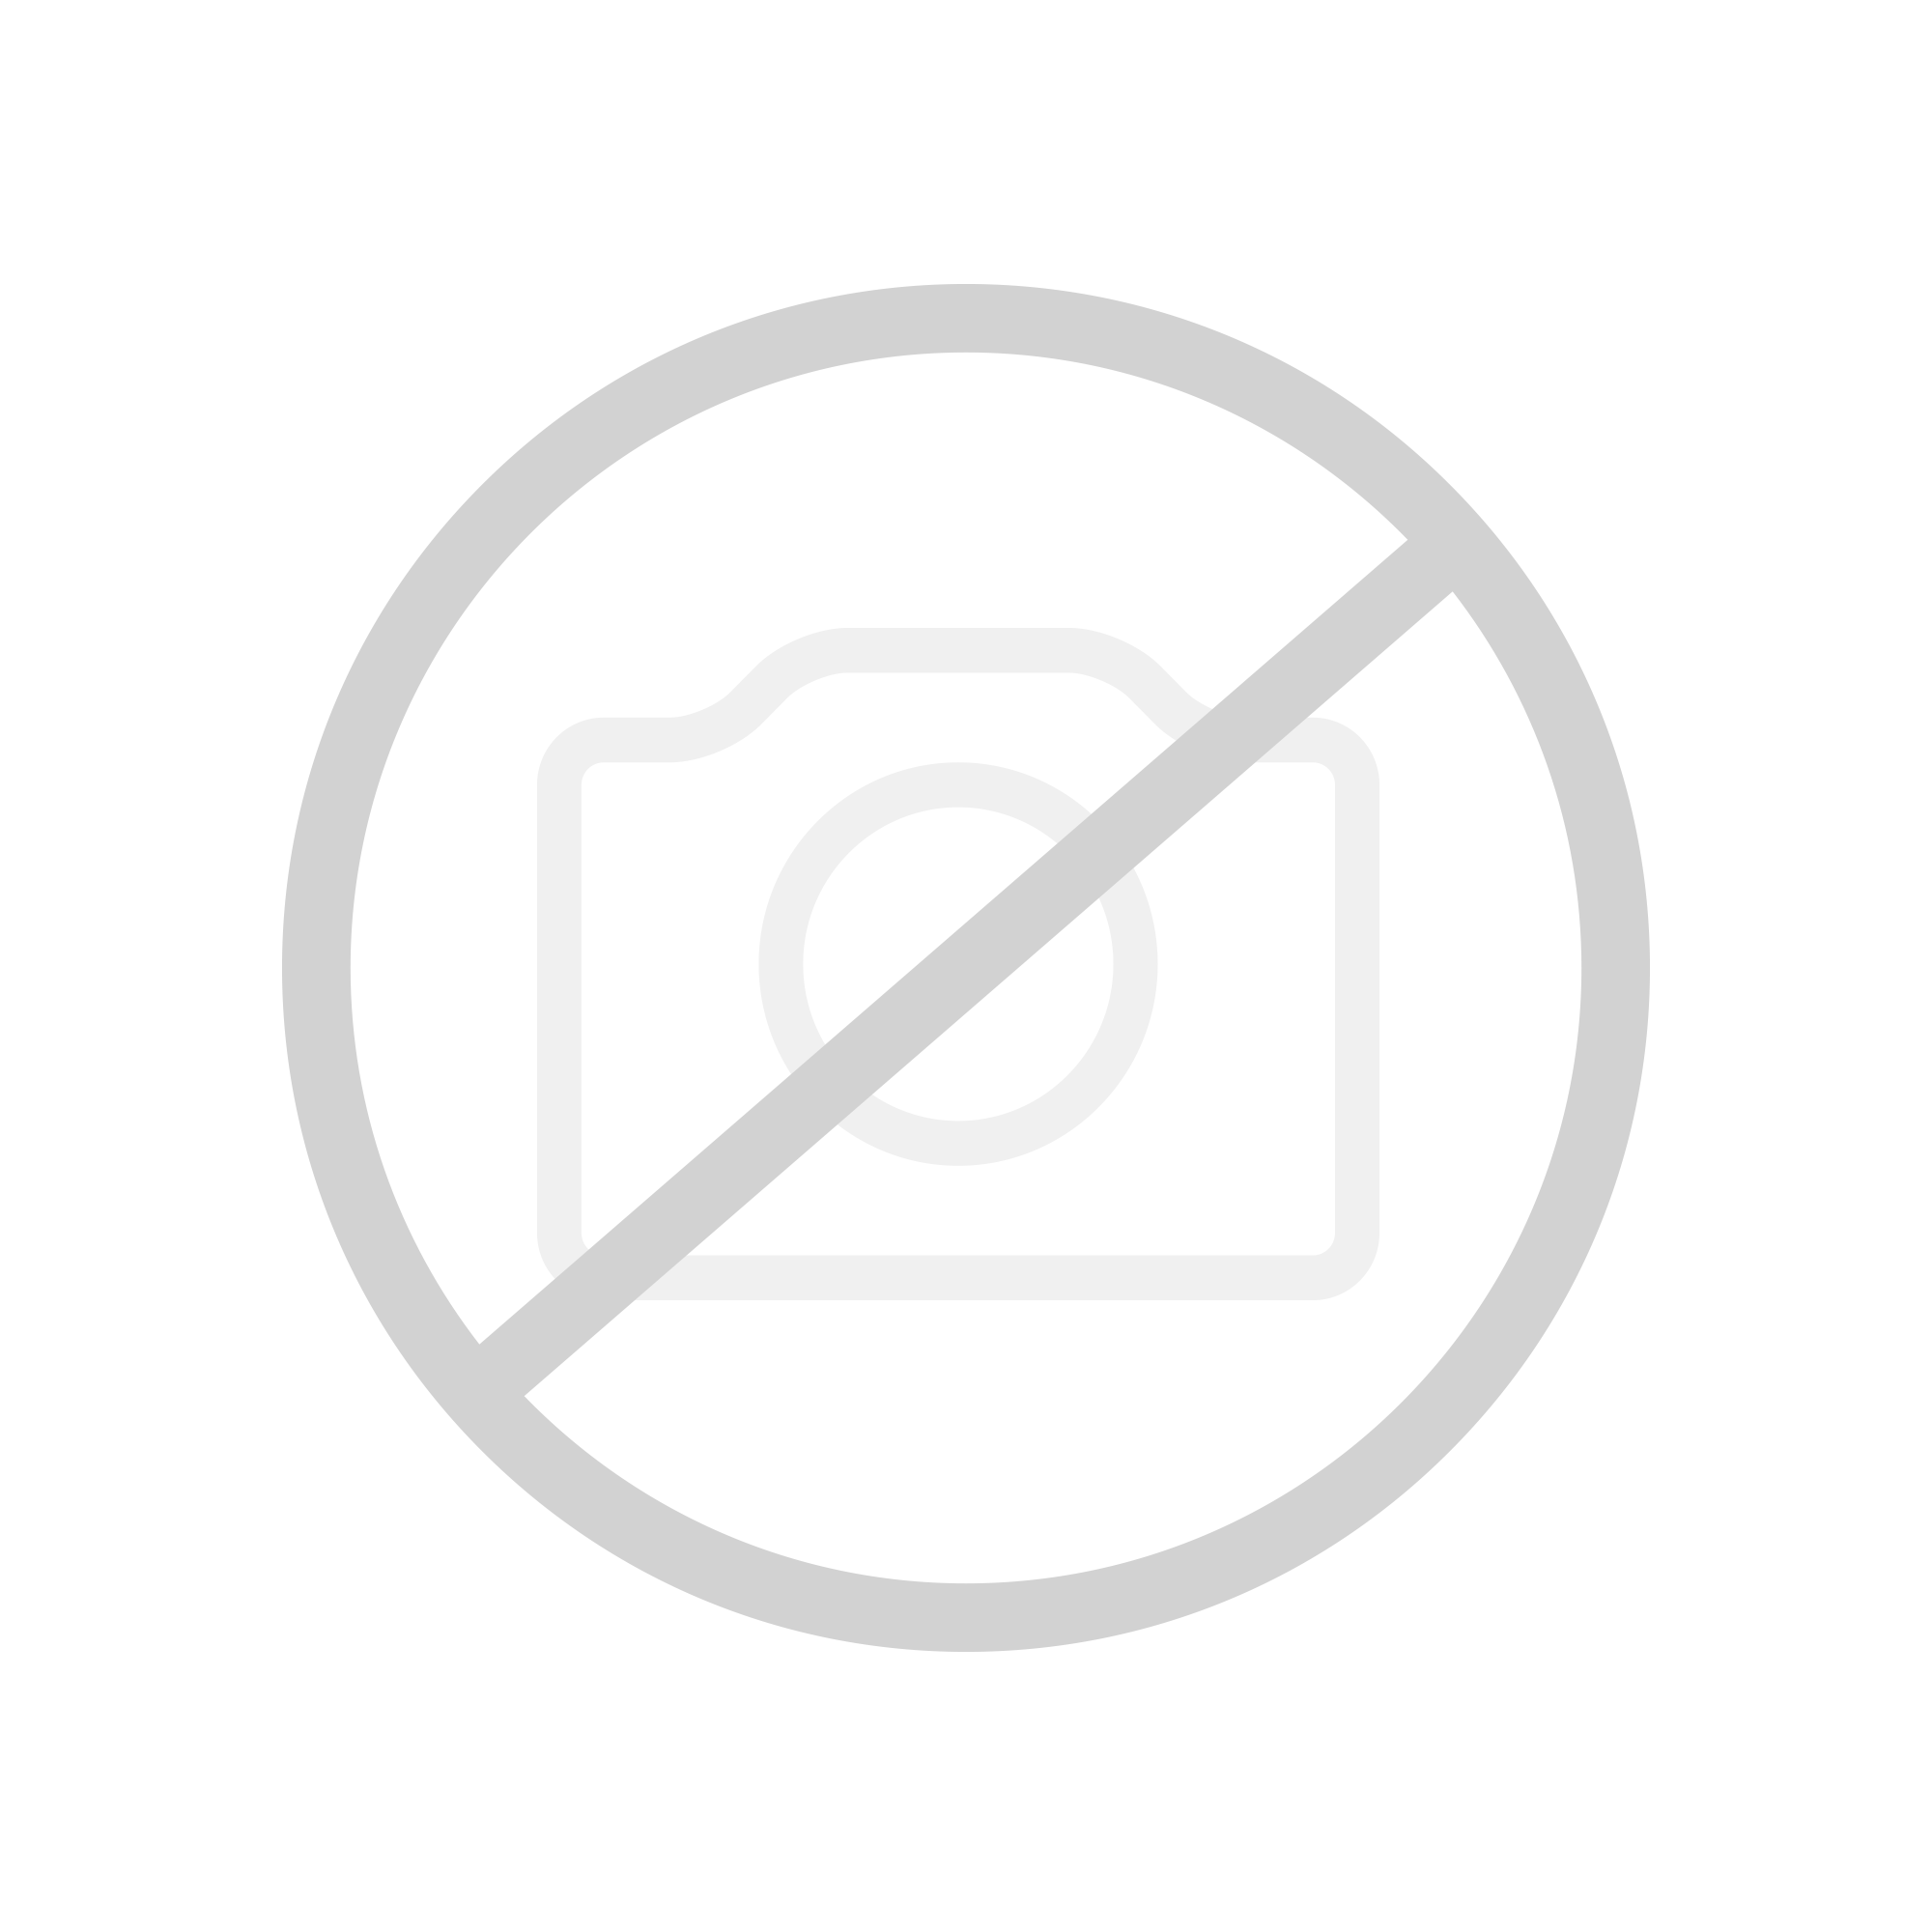 Steinberg Serie 160 freistehende Wanne/Brause-Armatur